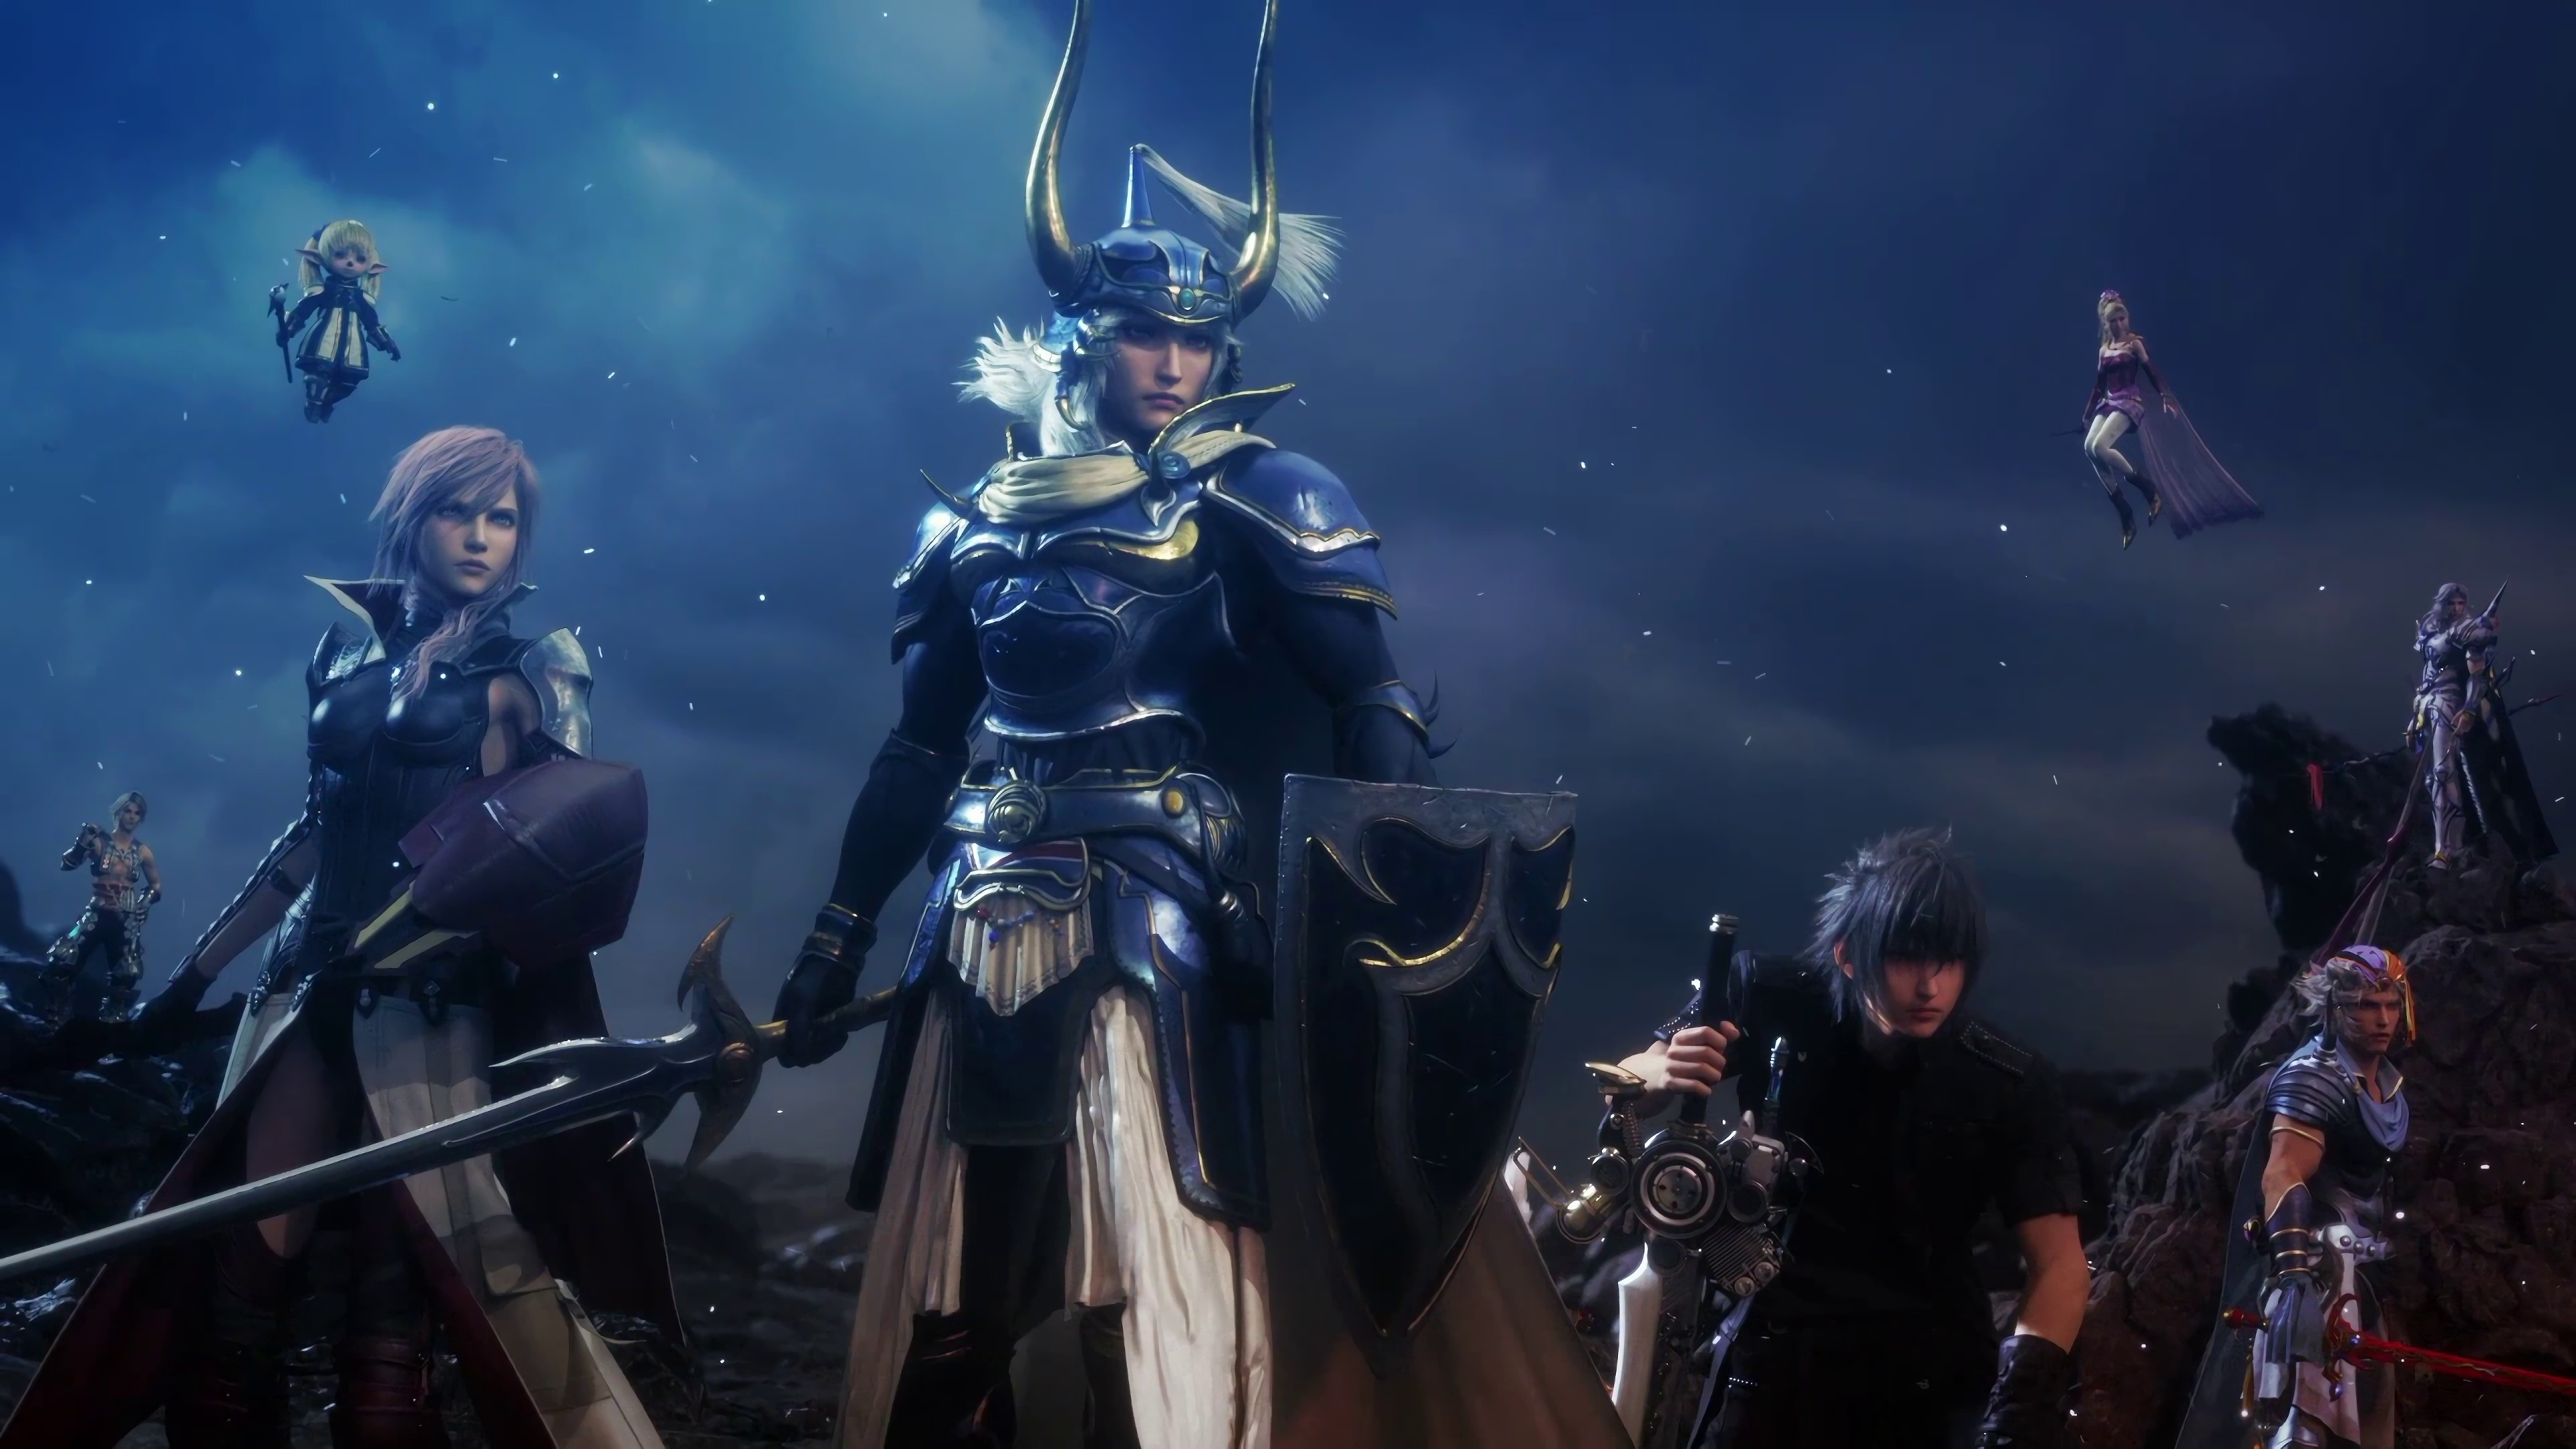 Dissidia Final Fantasy Nt Heroes 4k Wallpaper Dissidia Final